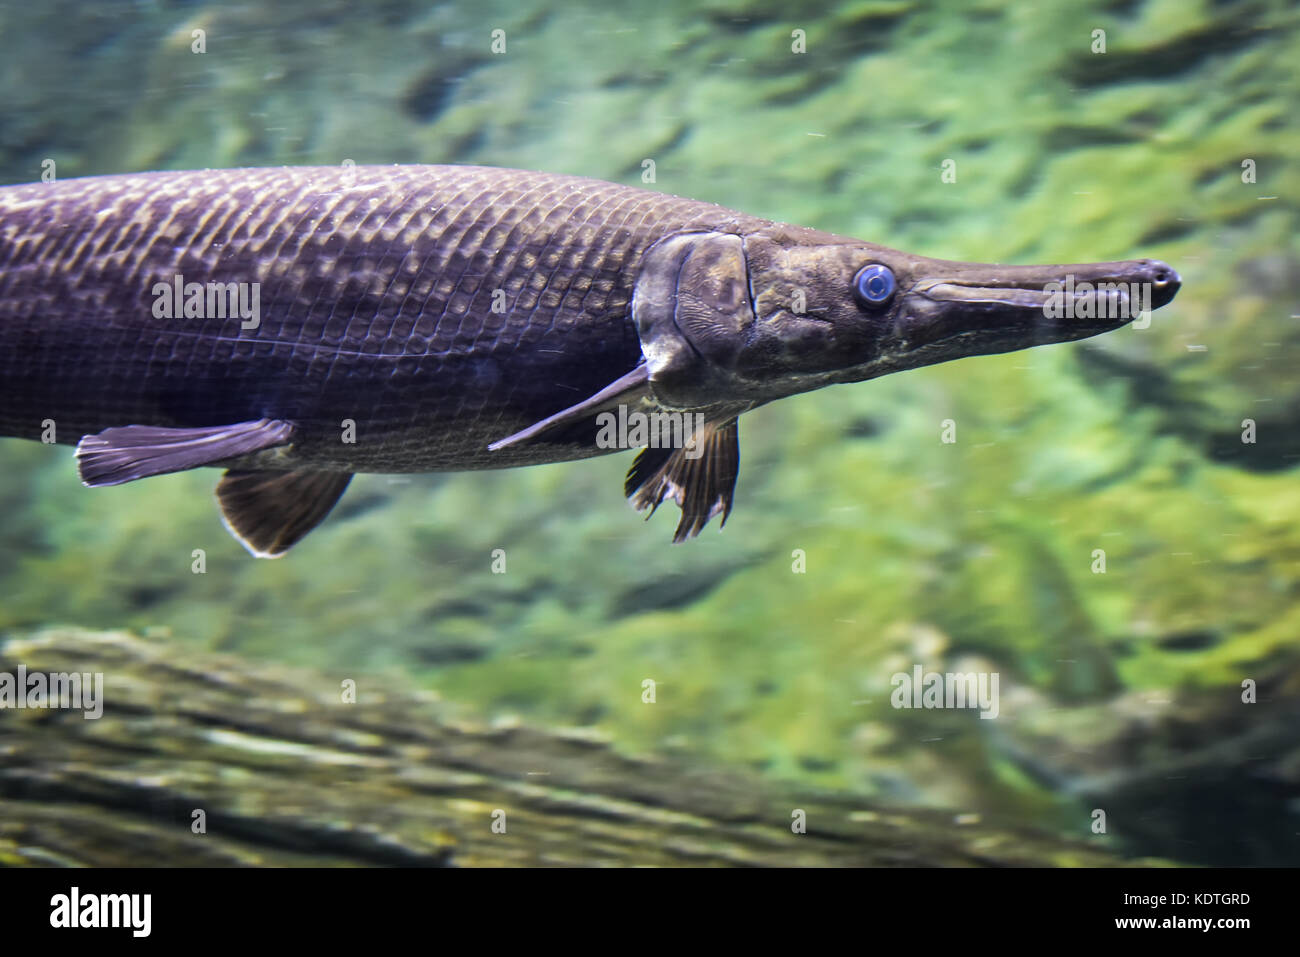 Arapaima Fish Stock Photos & Arapaima Fish Stock Images ...